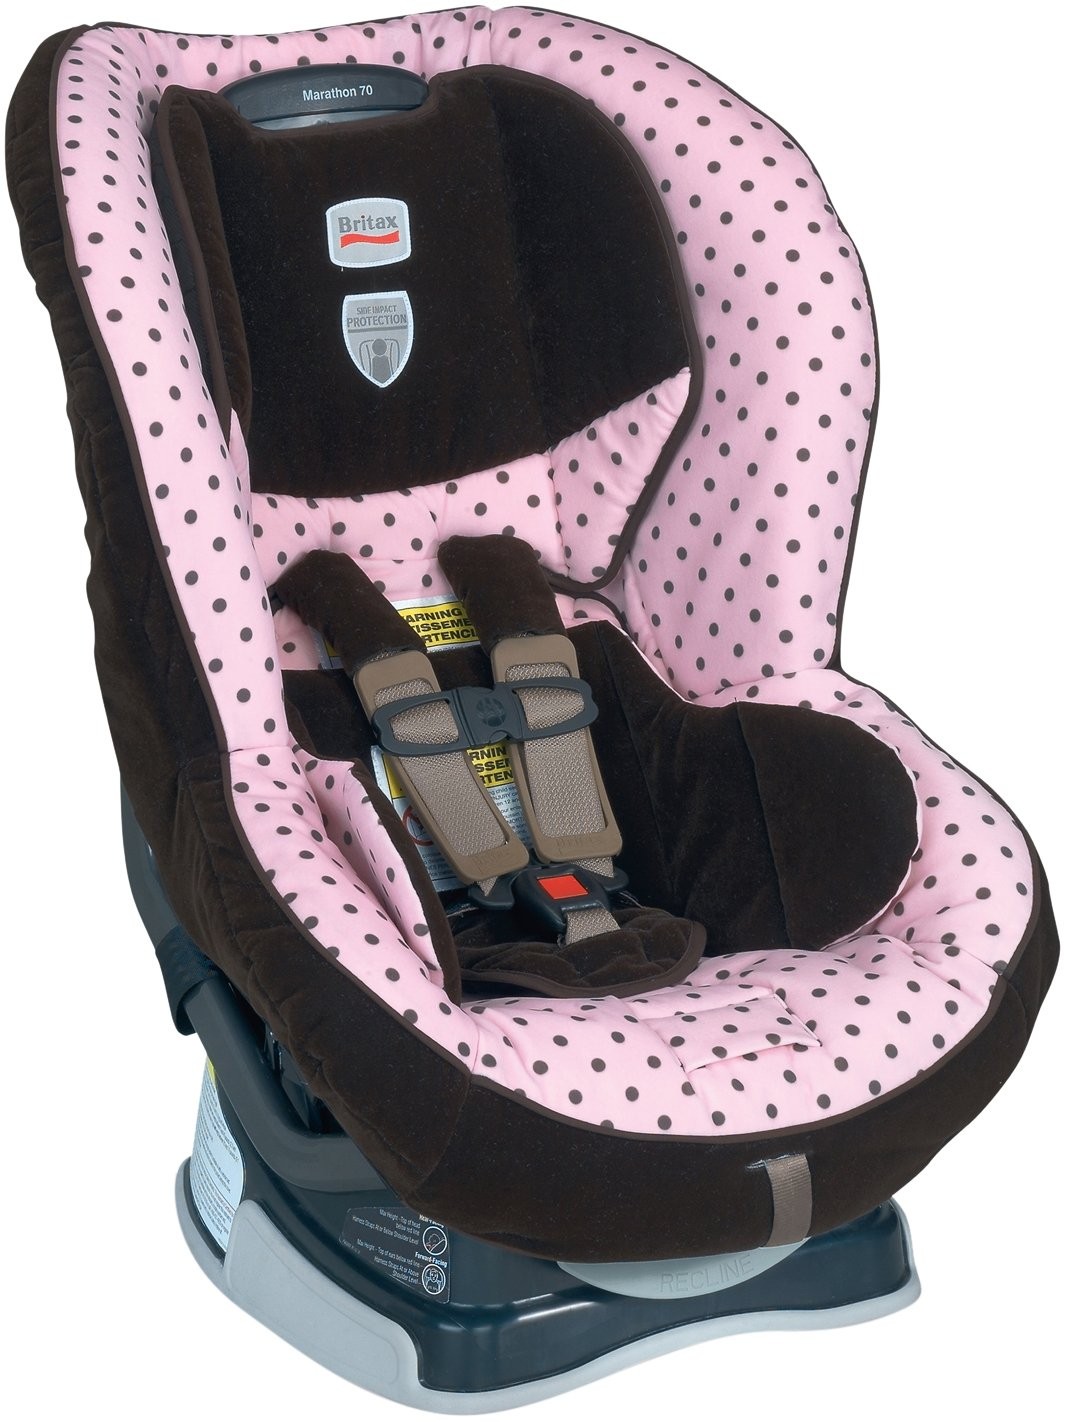 Amazon Britax Marathon 70 Convertible Car Seat Previous Version Allison Prior Model Baby